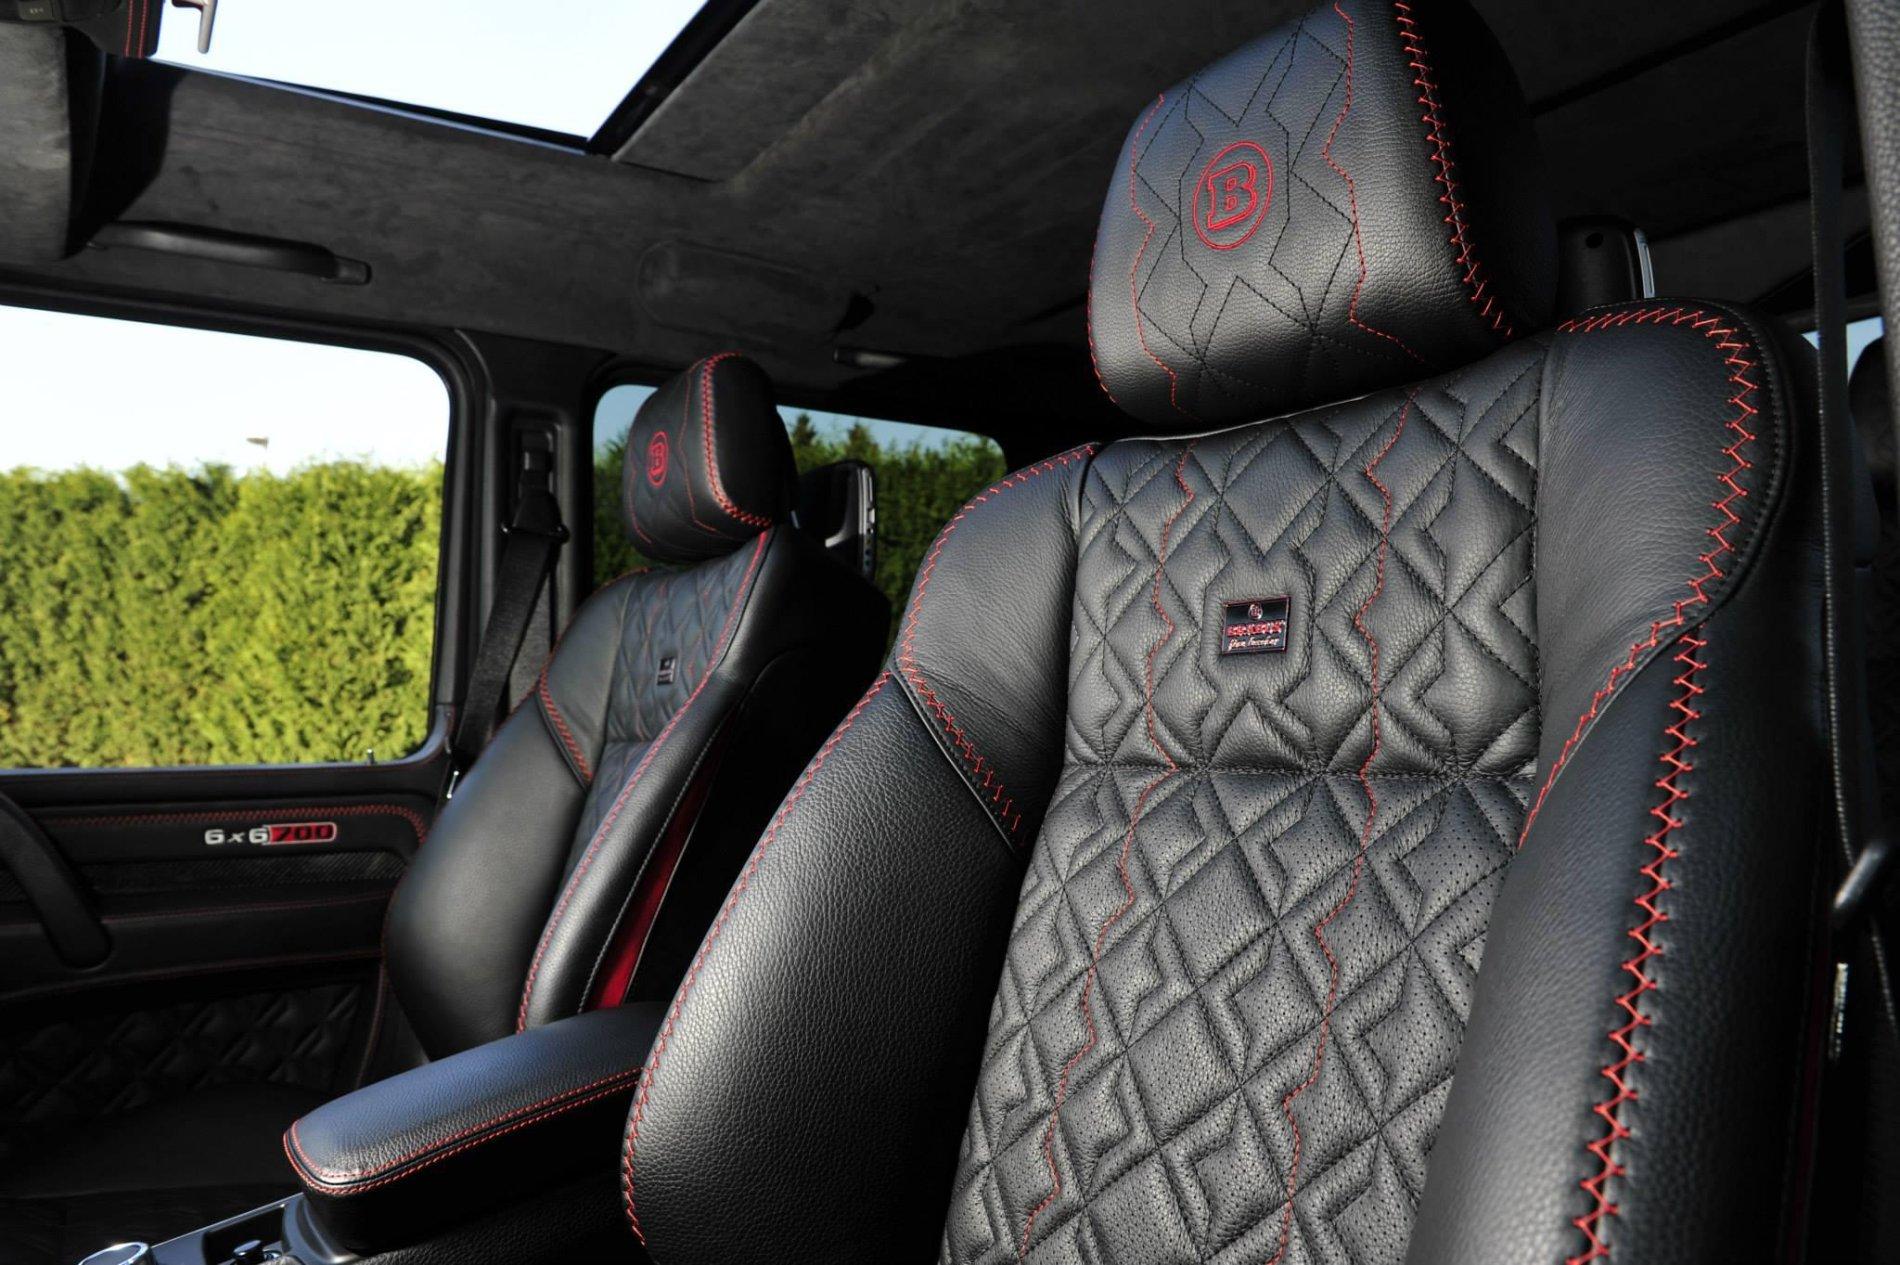 Mercedes G63 AMG 6x6 by Brabus - Tuning Interior - Mercedes G63 AMG 6x6 by Brabus - Tuning Interior